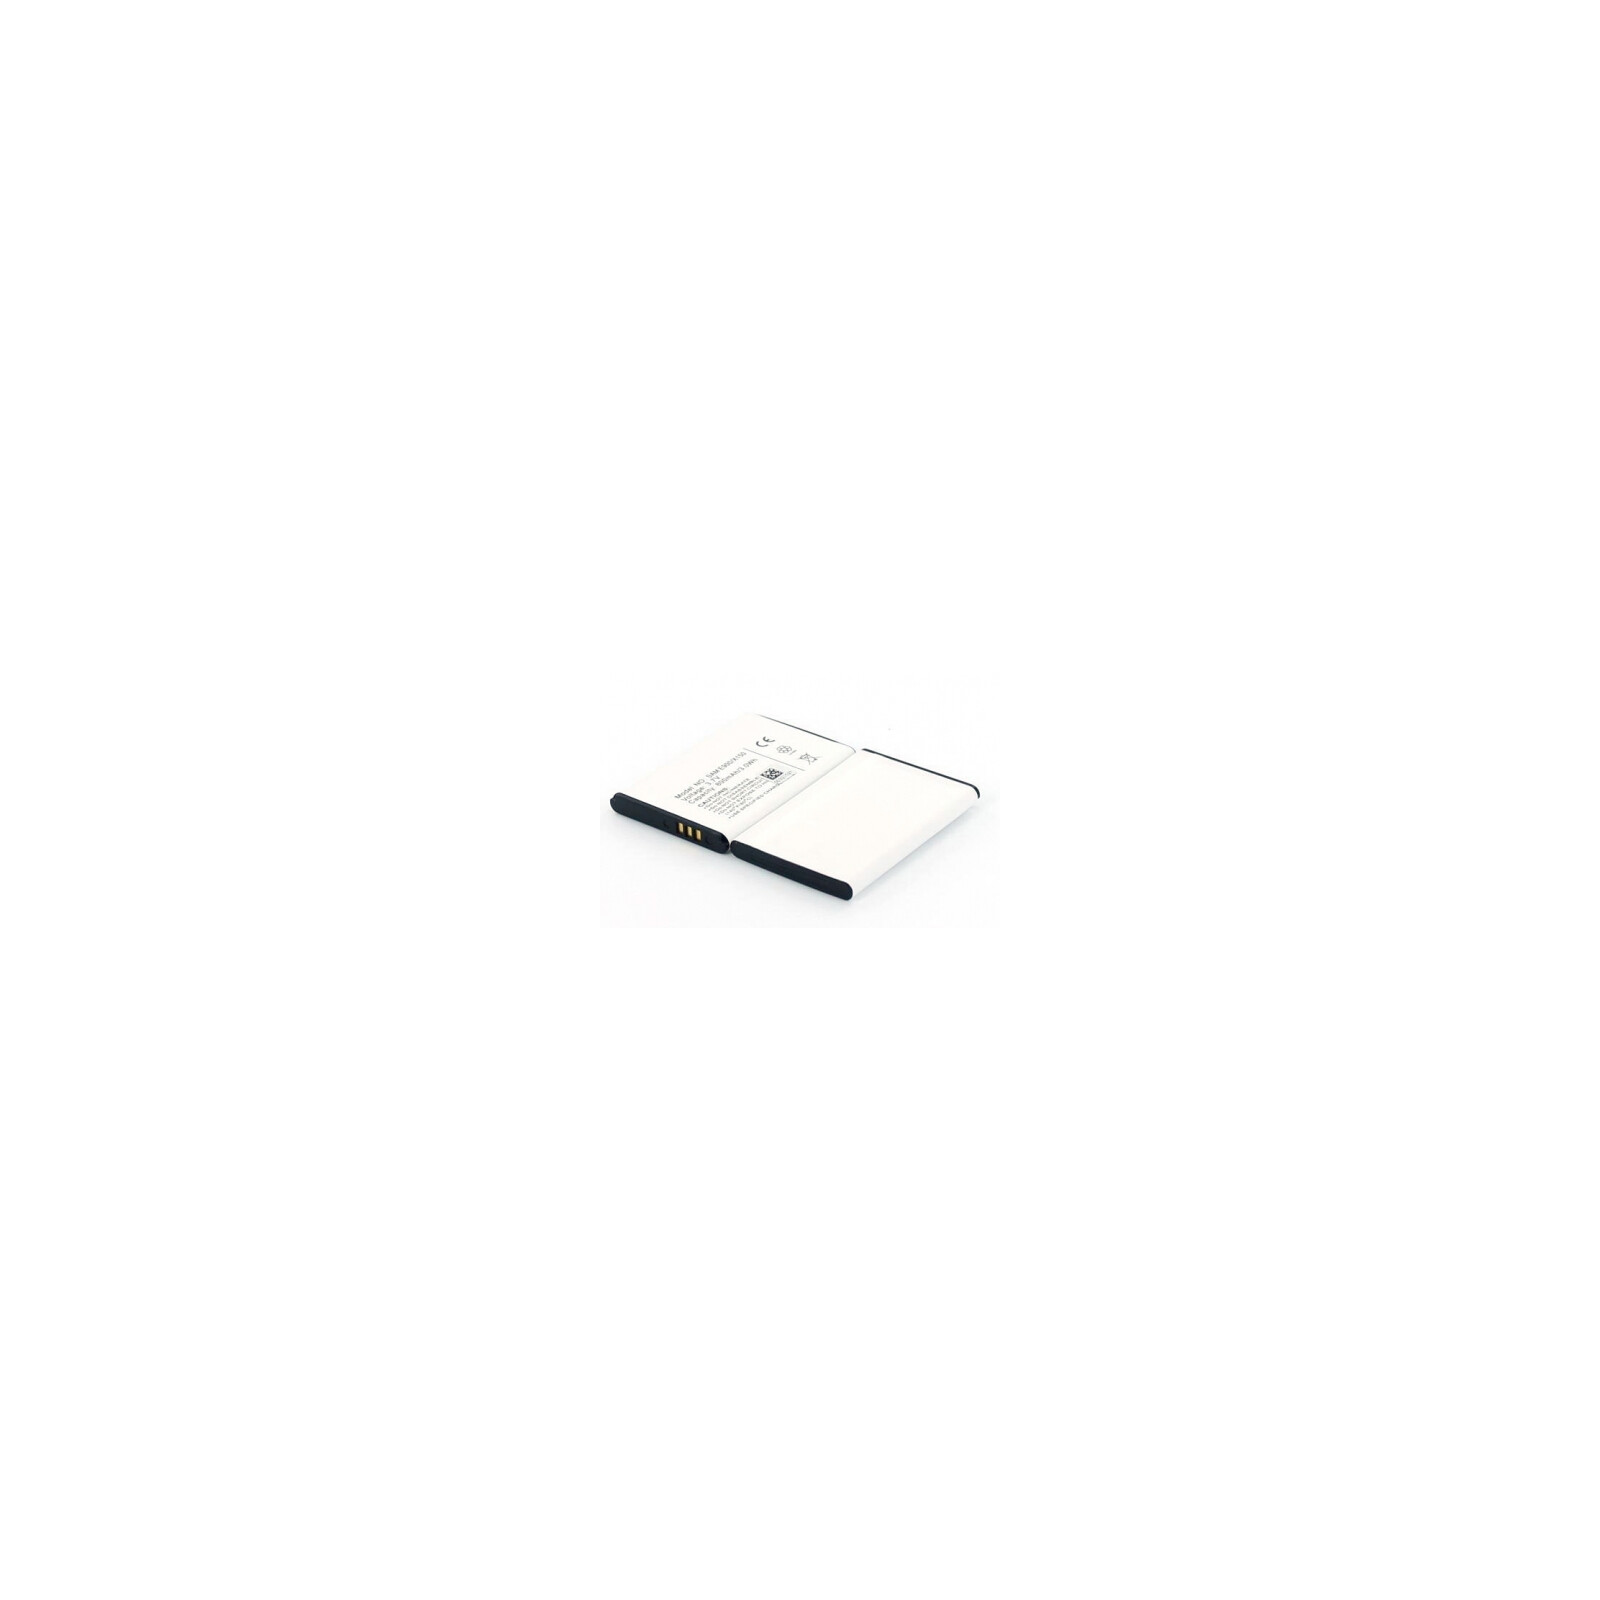 AGI Akku Samsung E2530 800mAh